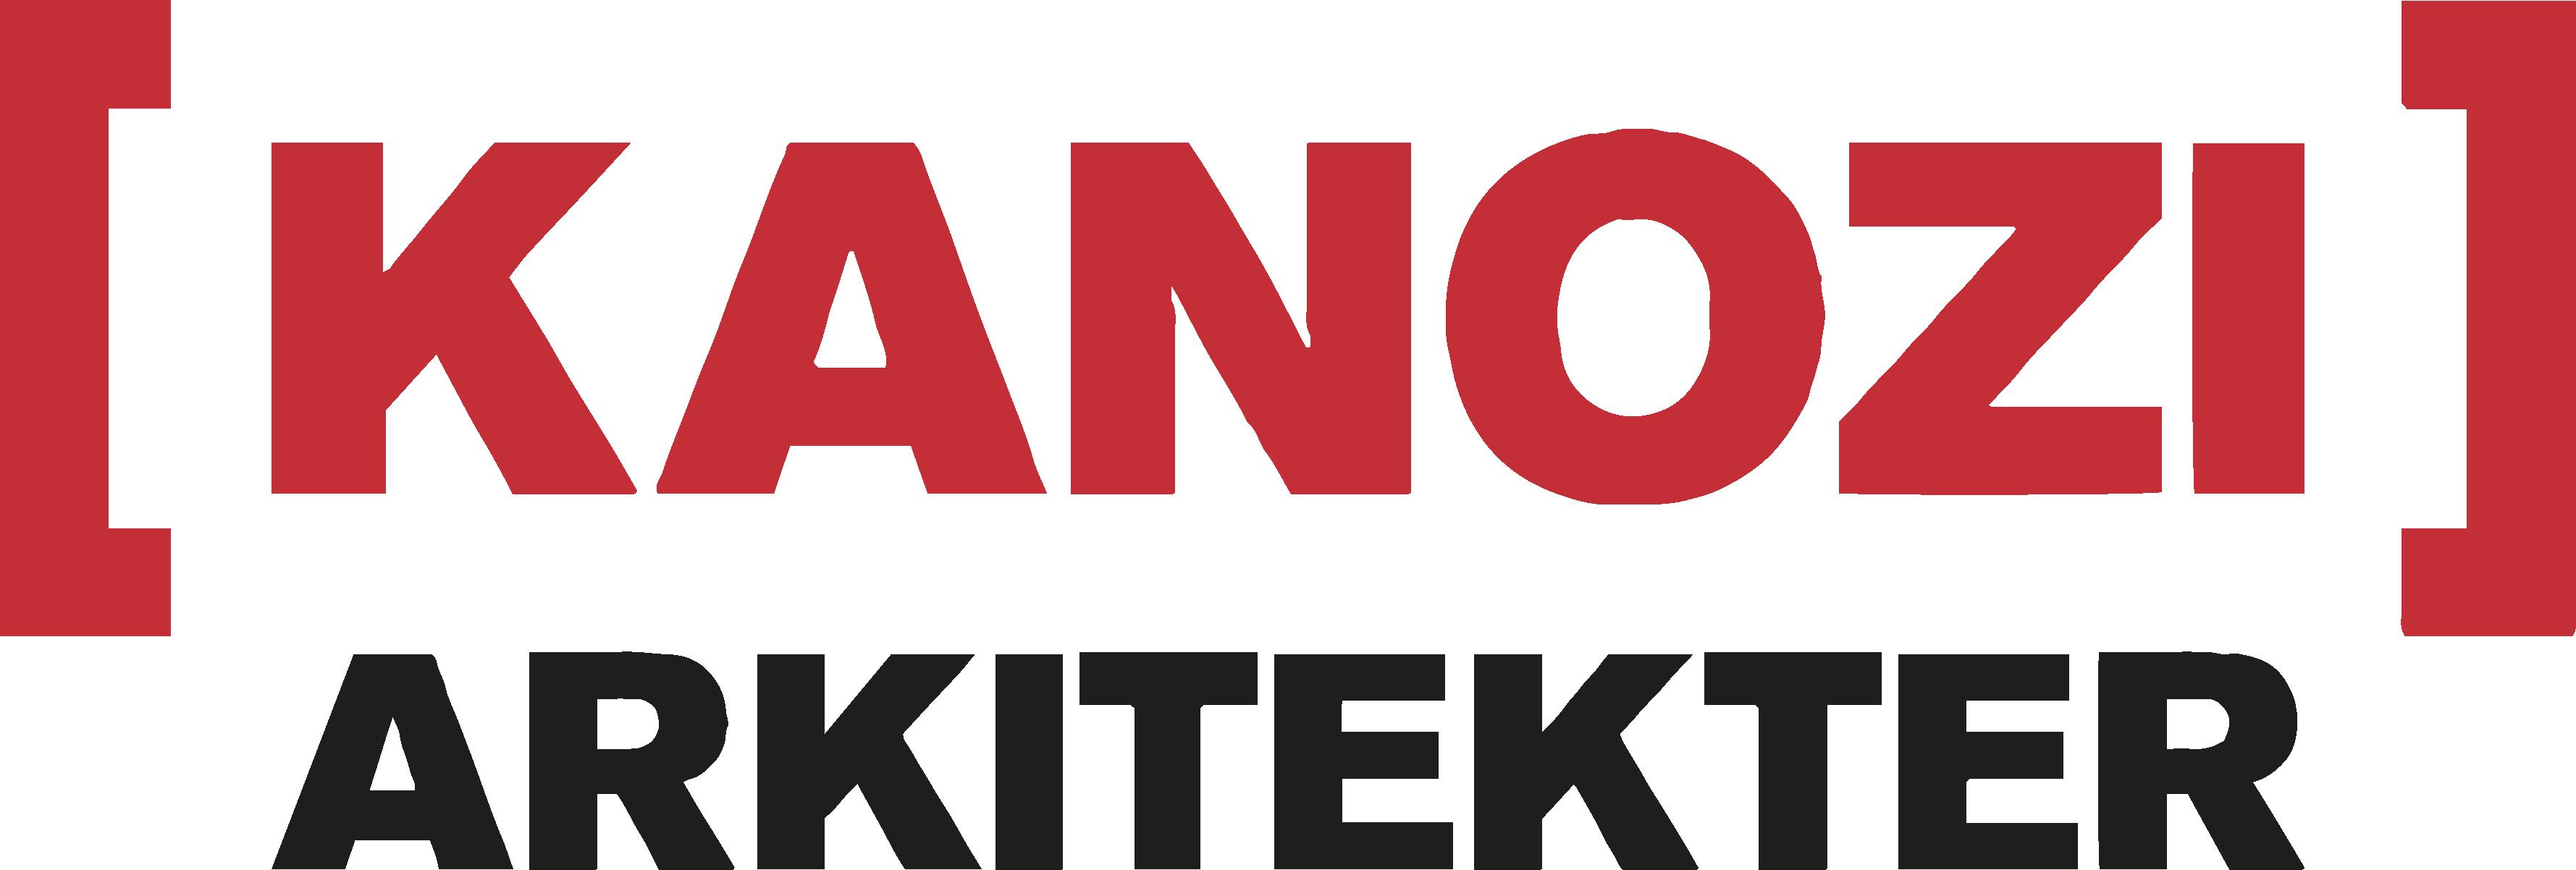 kanozi inredning & Design AB